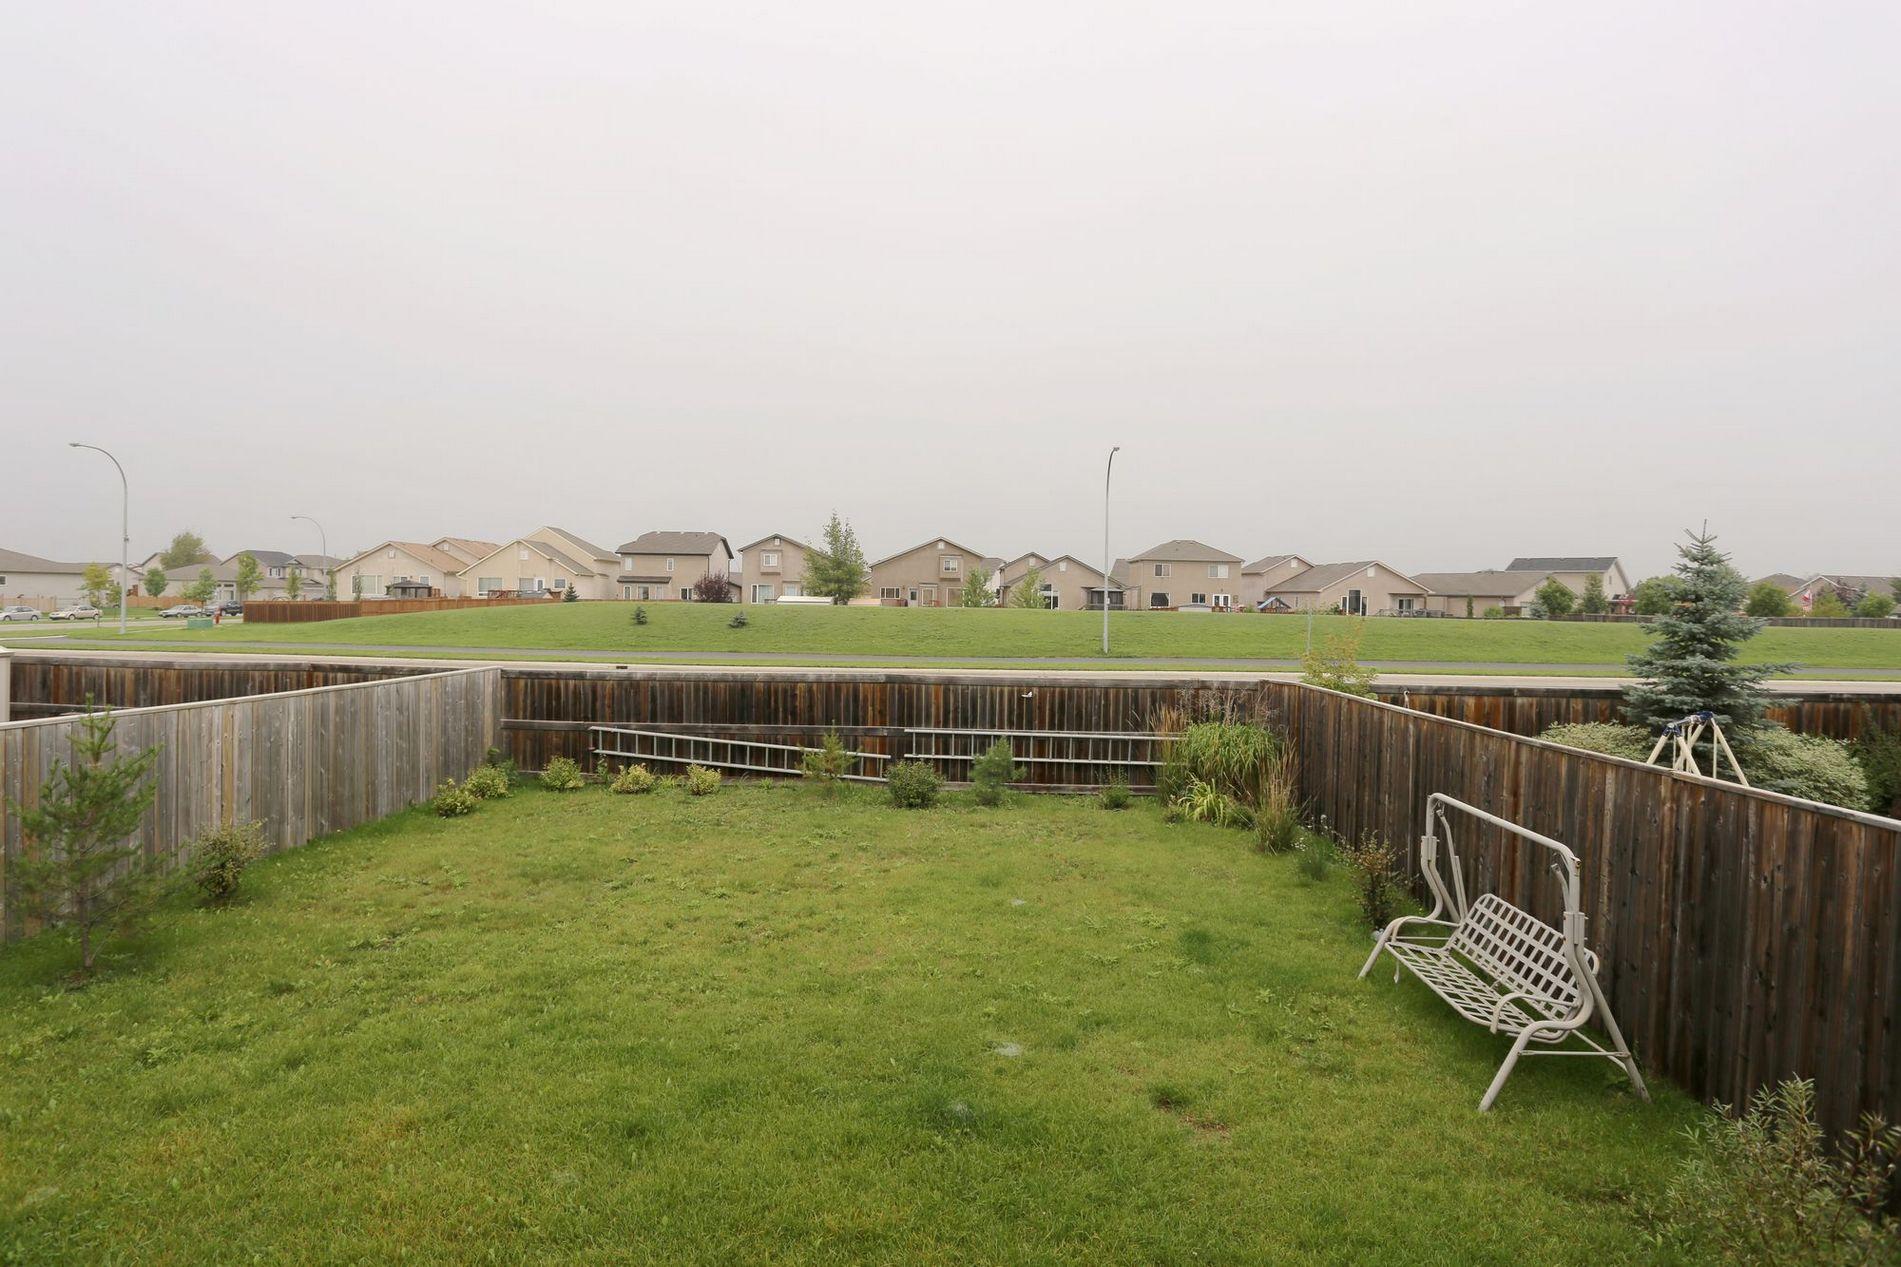 15 Nordstrom Drive, Winnipeg, Manitoba  R3X 0A5 - Photo 23 - 1524618